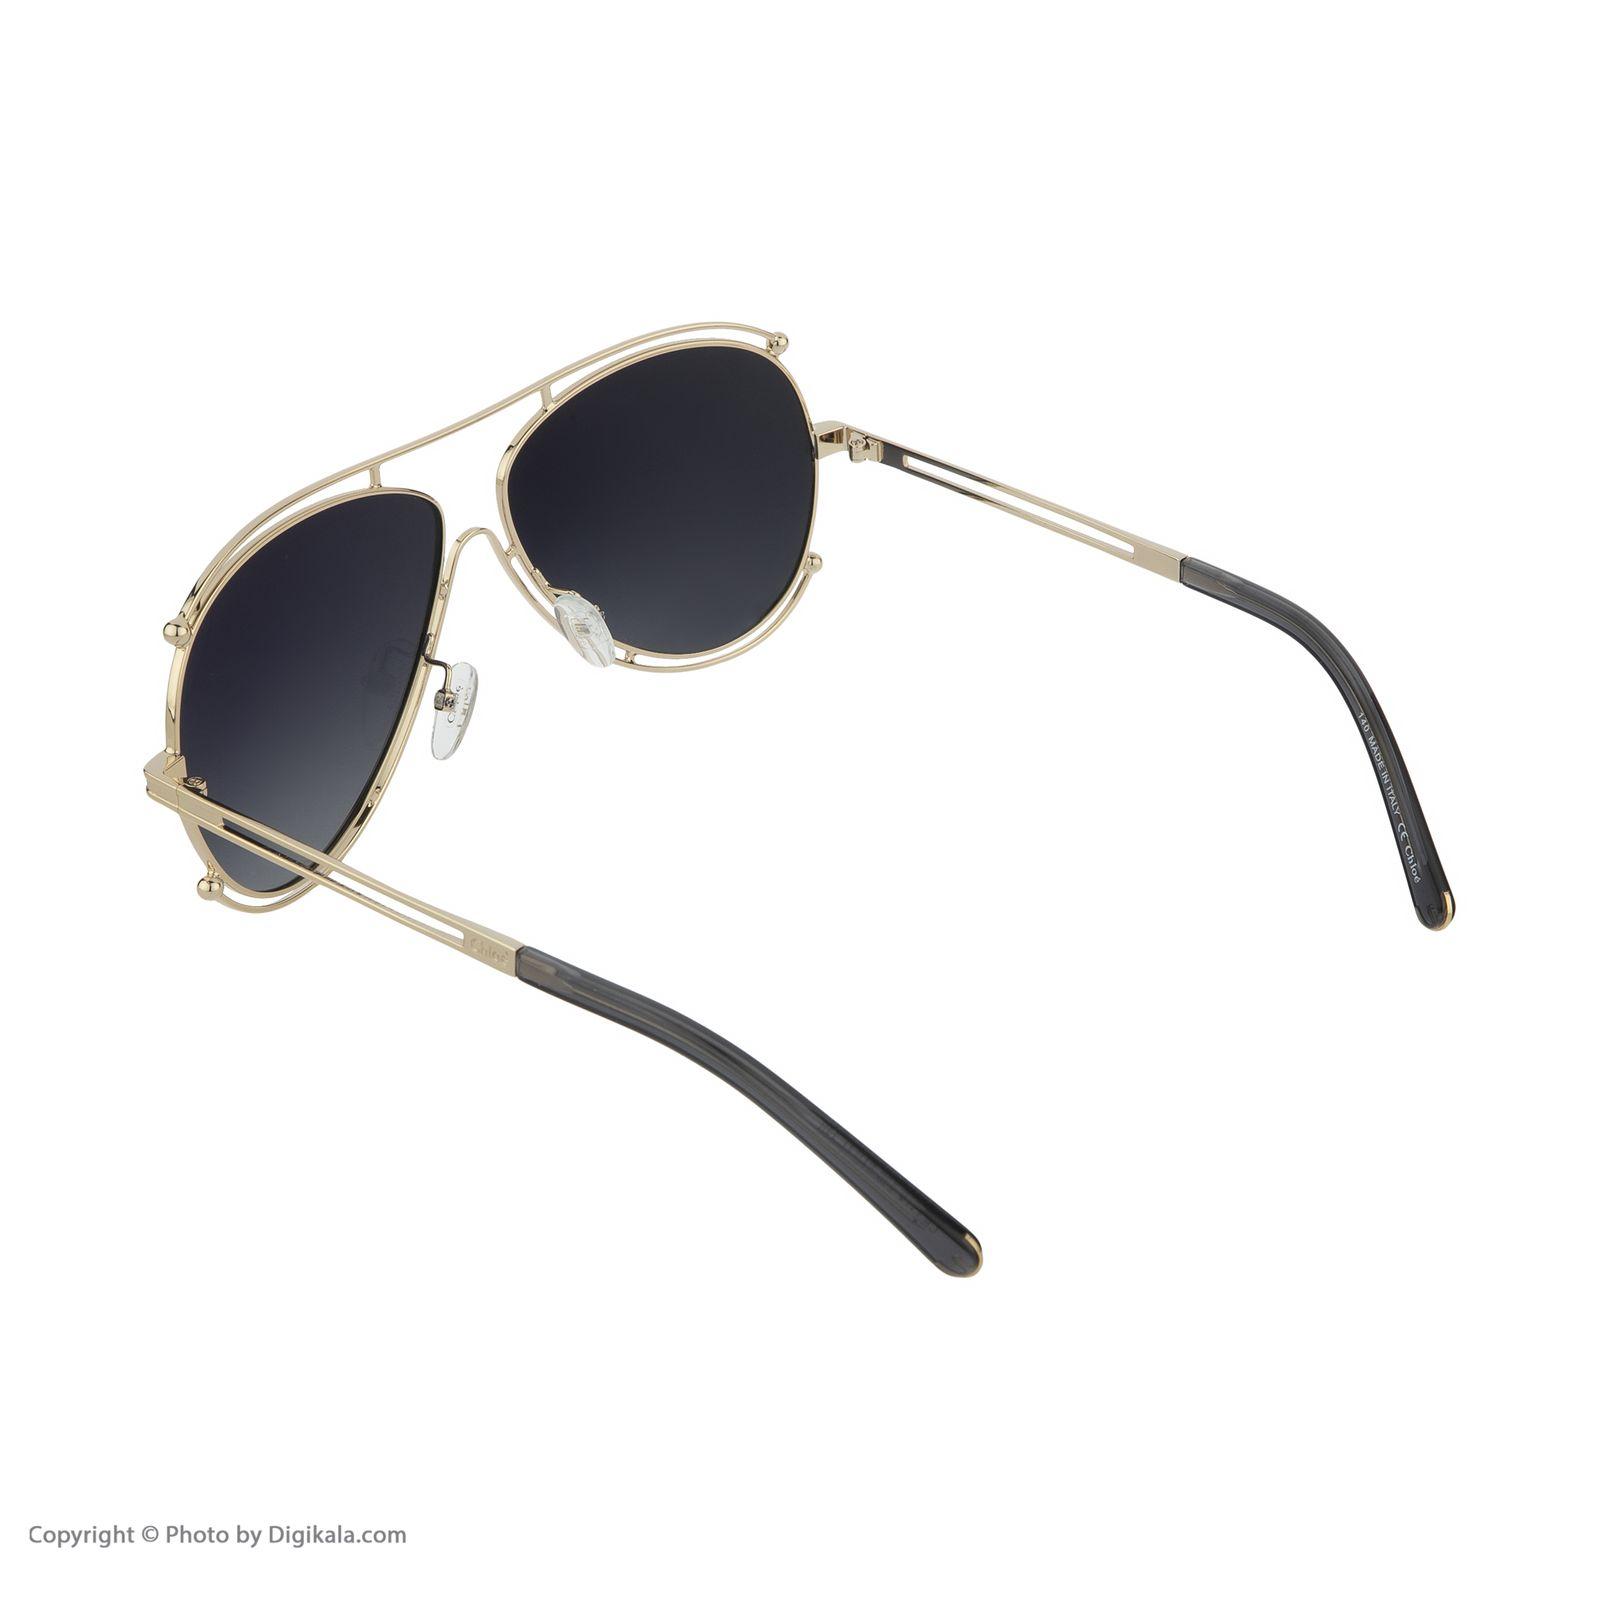 عینک آفتابی کلویی مدل 121s -  - 5